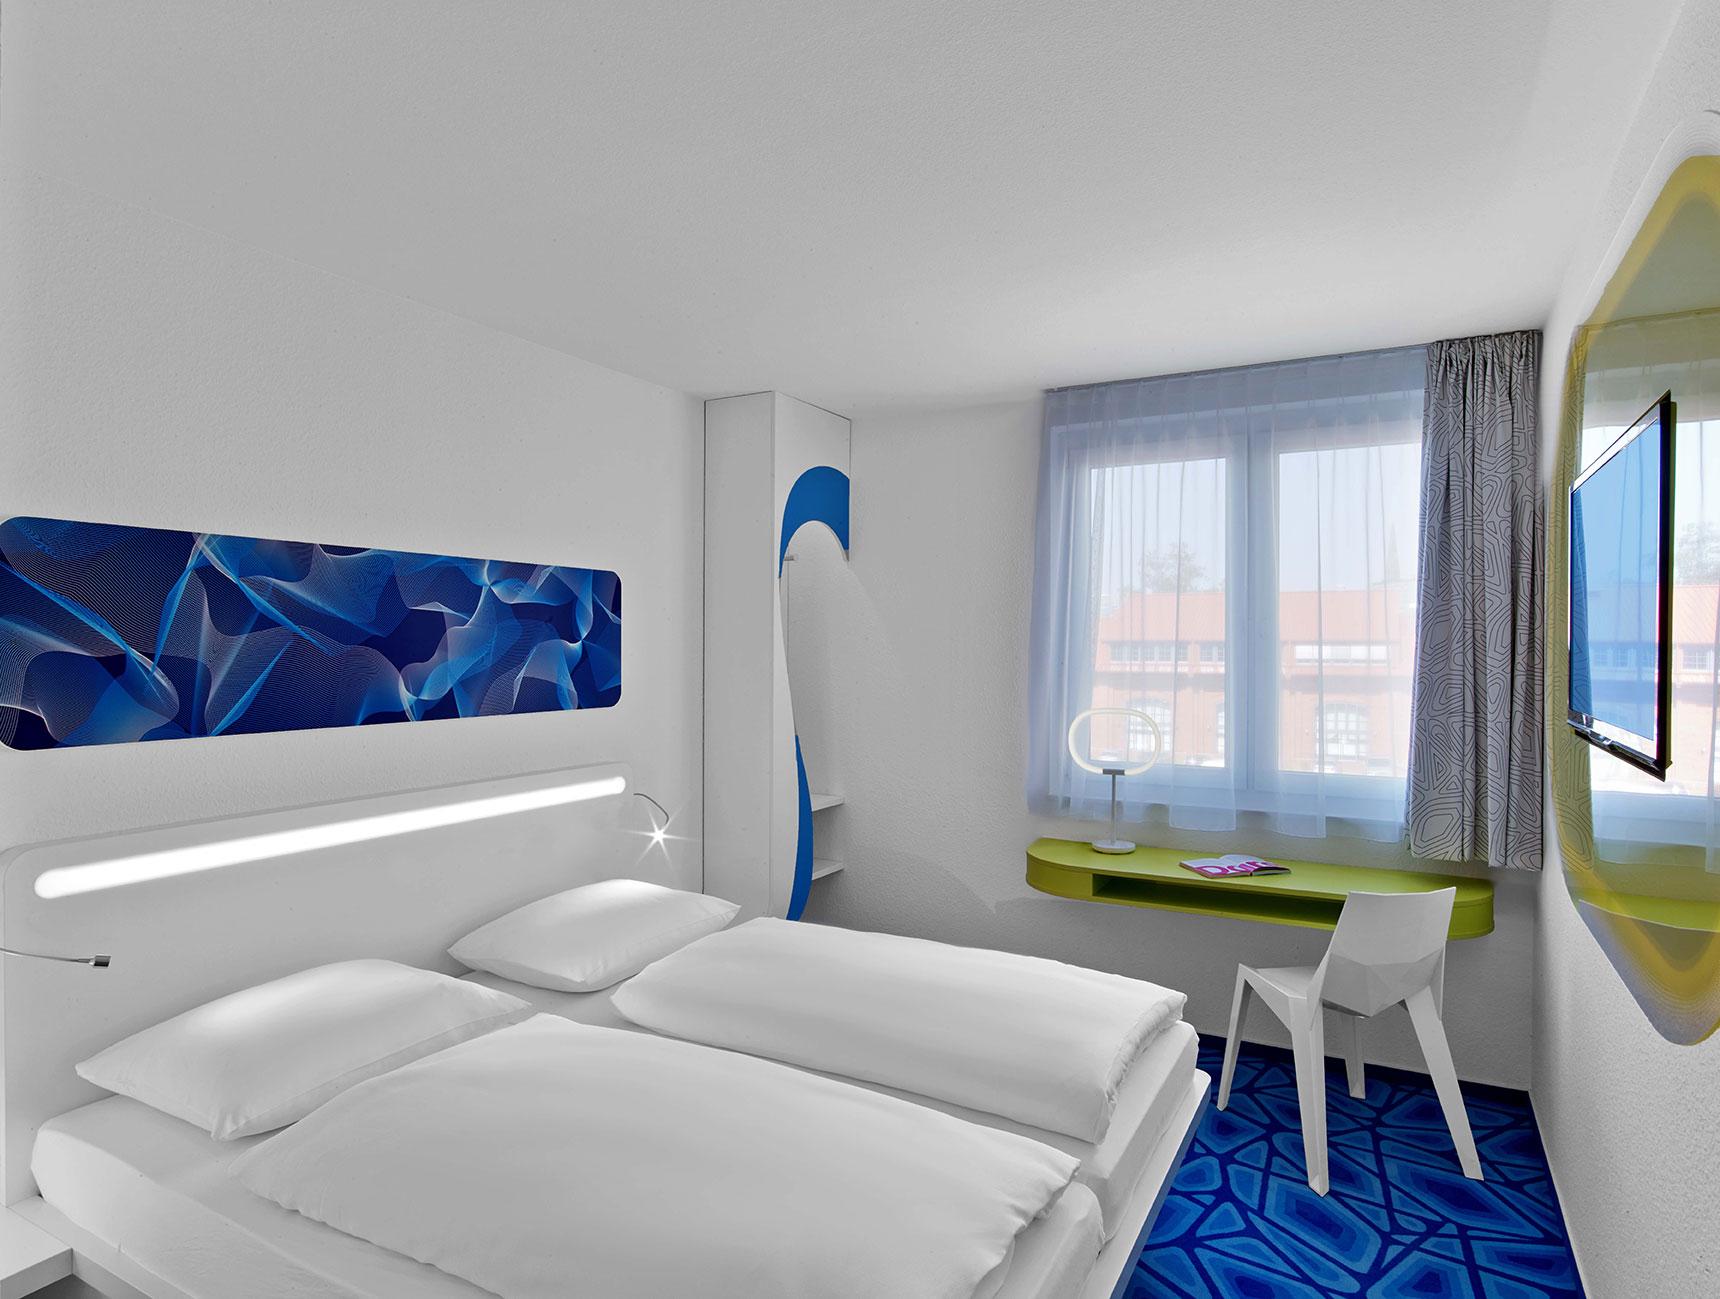 prizeotel Hamburg-City - your room